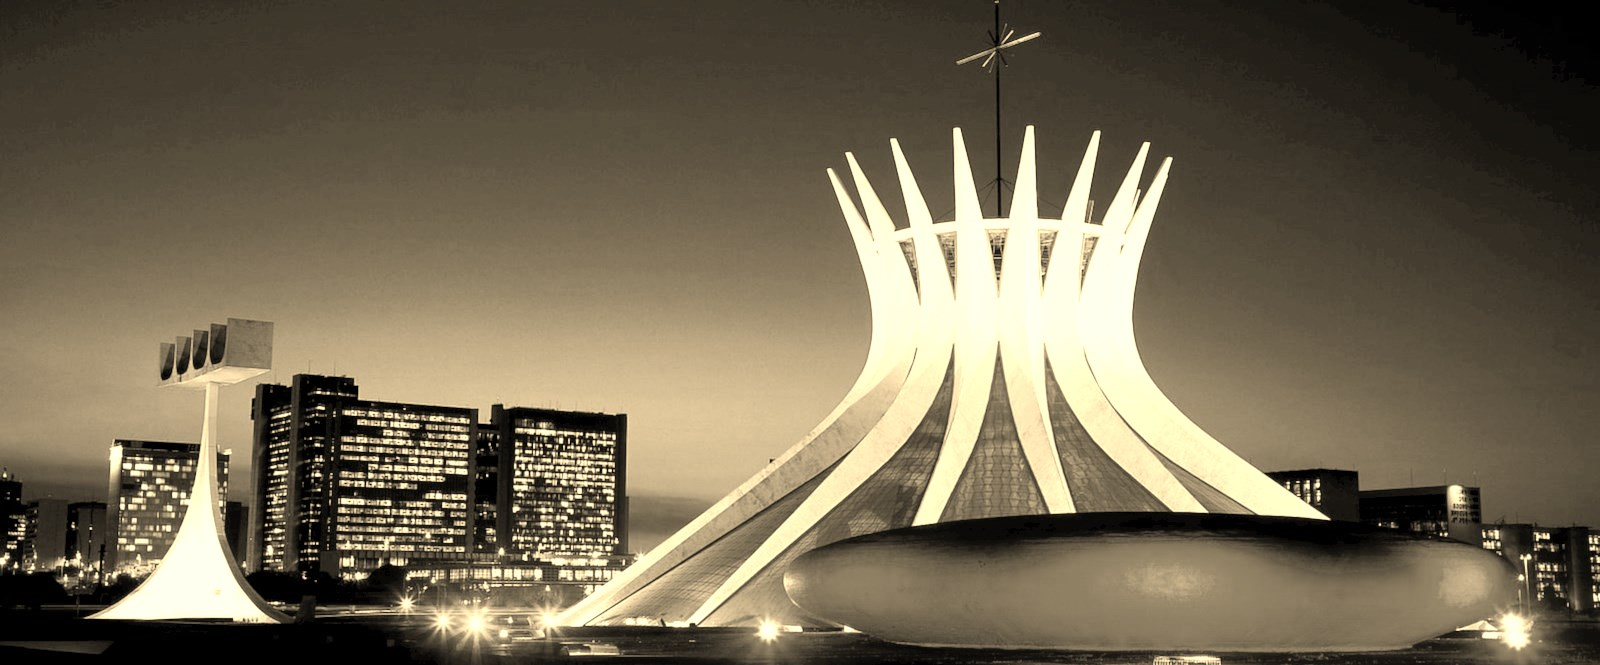 brasilia-capital-du-bresil.jpg